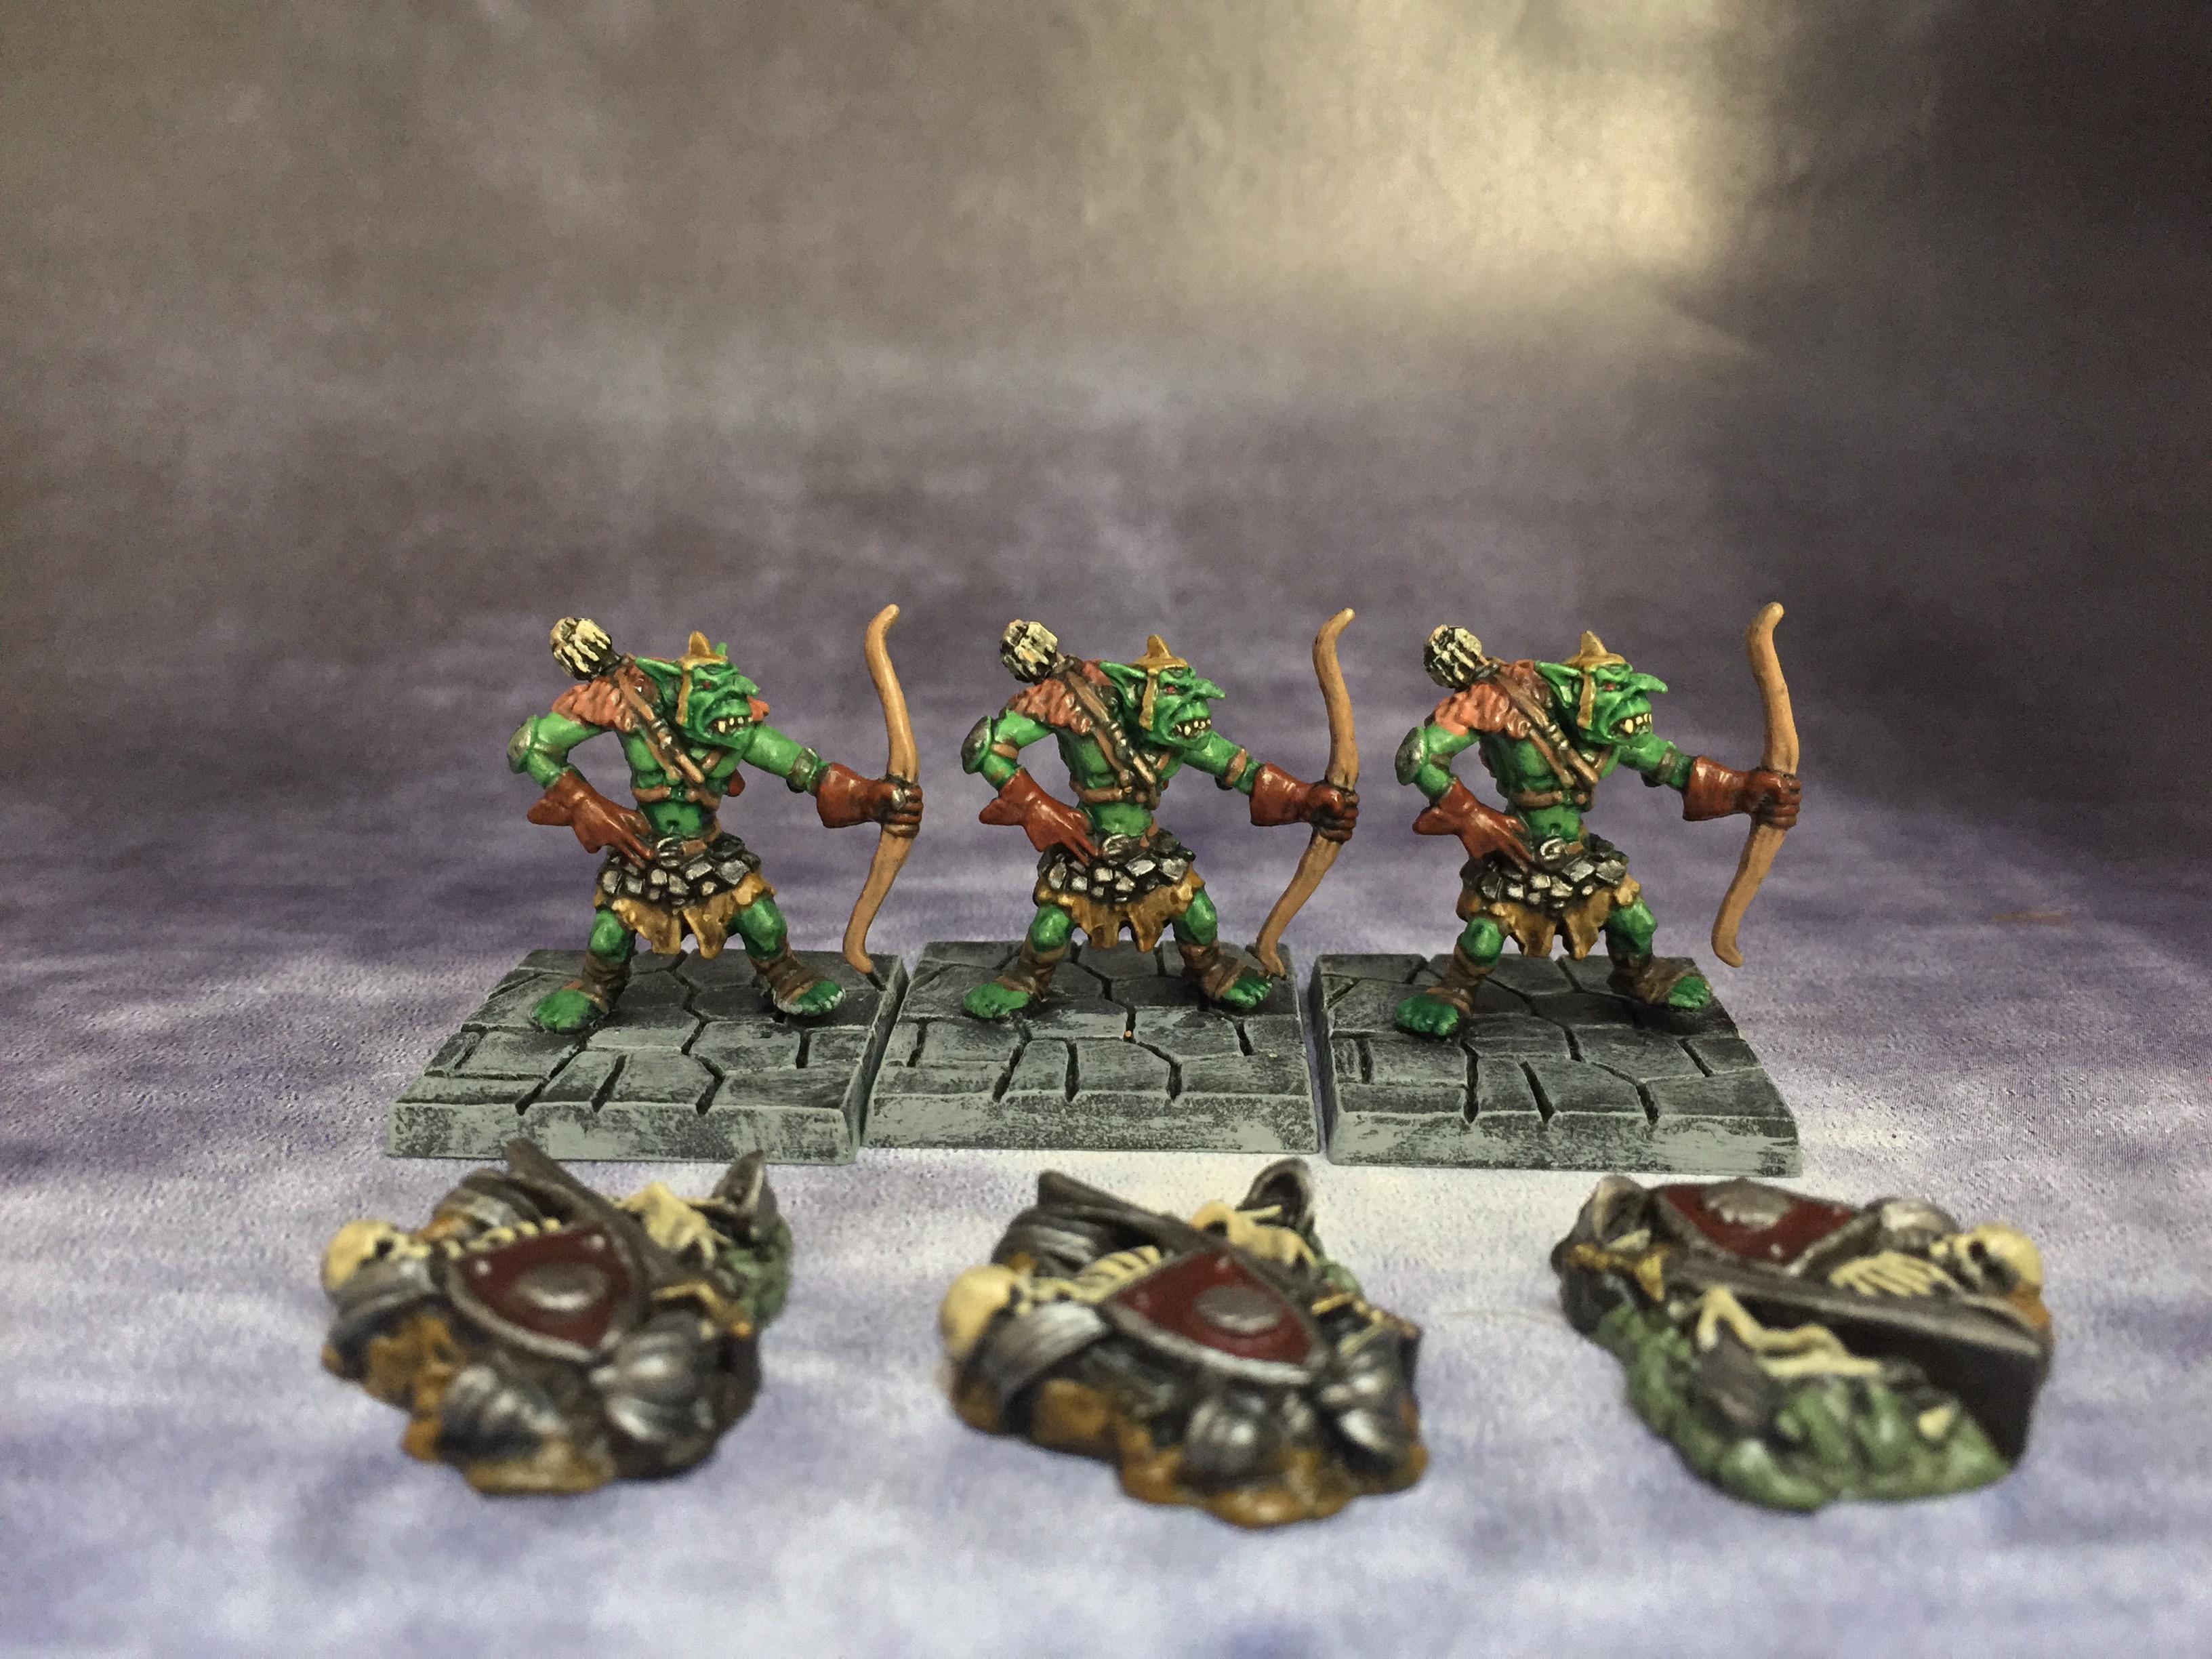 Archers, Bone Pile, Dungeon Saga, Goblins, June 2016, Mantic, Skeletons